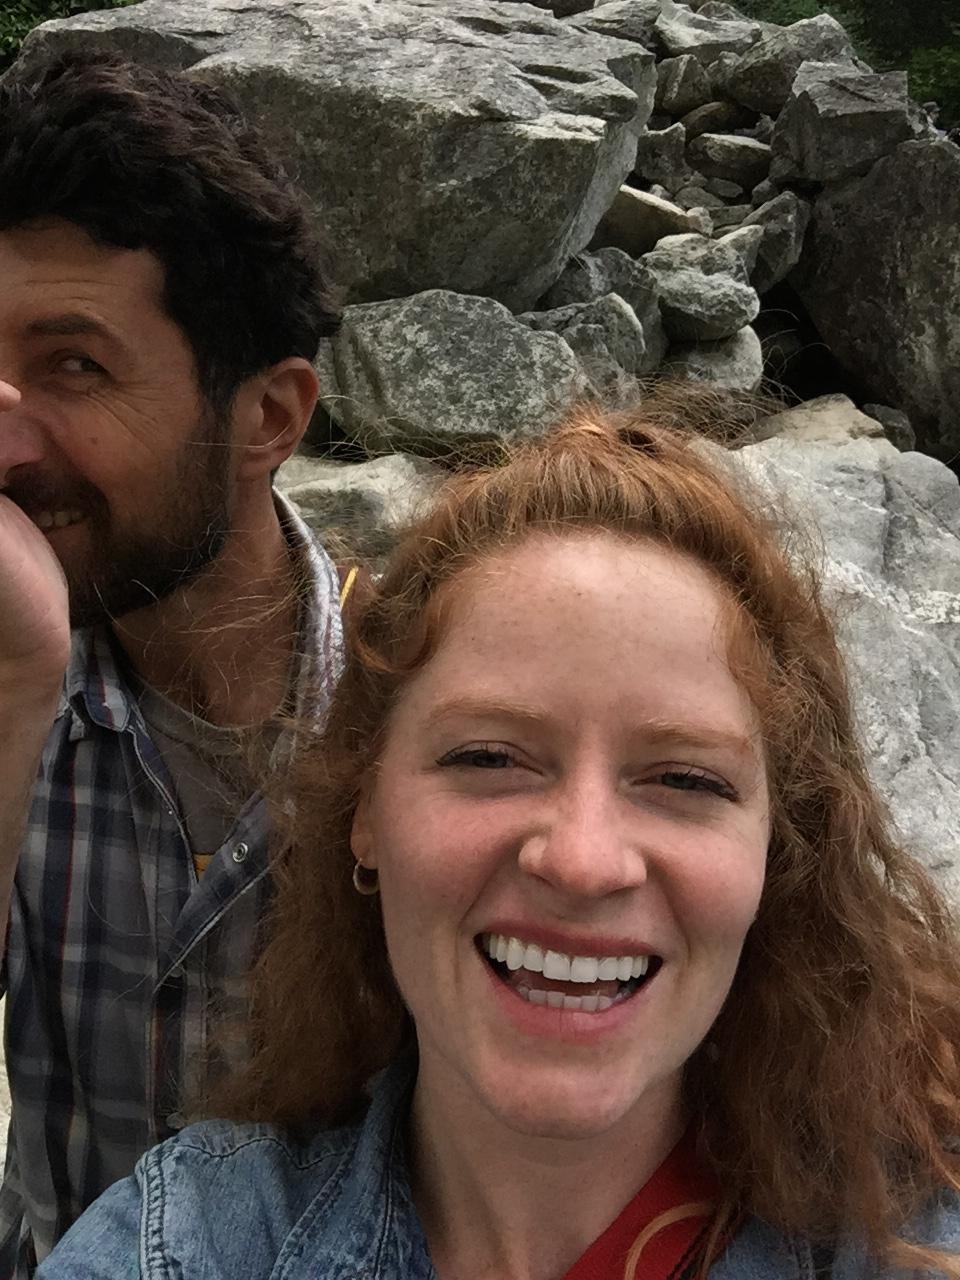 I love our selfie fails.